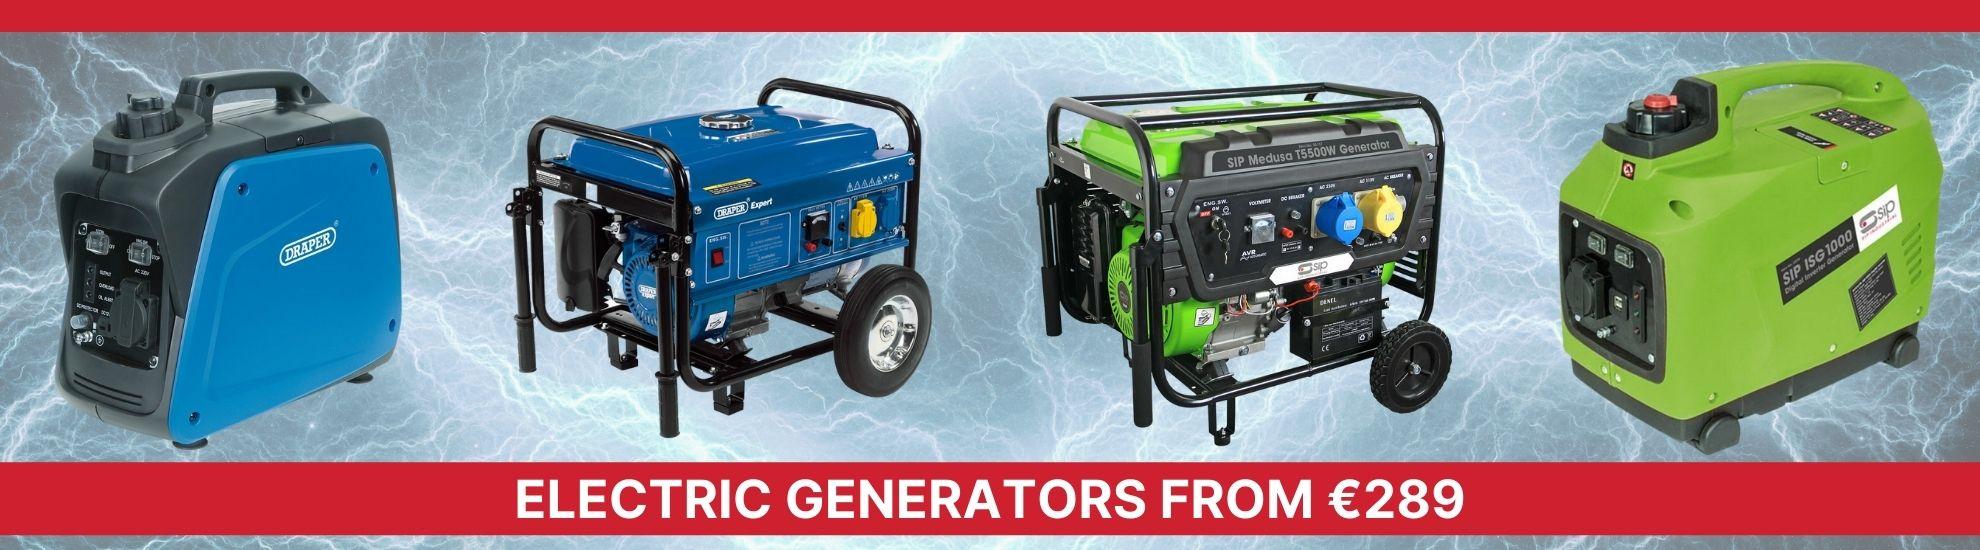 Draper generator, sip generator, power generator, electric generator, petrol generator, diesel generator,